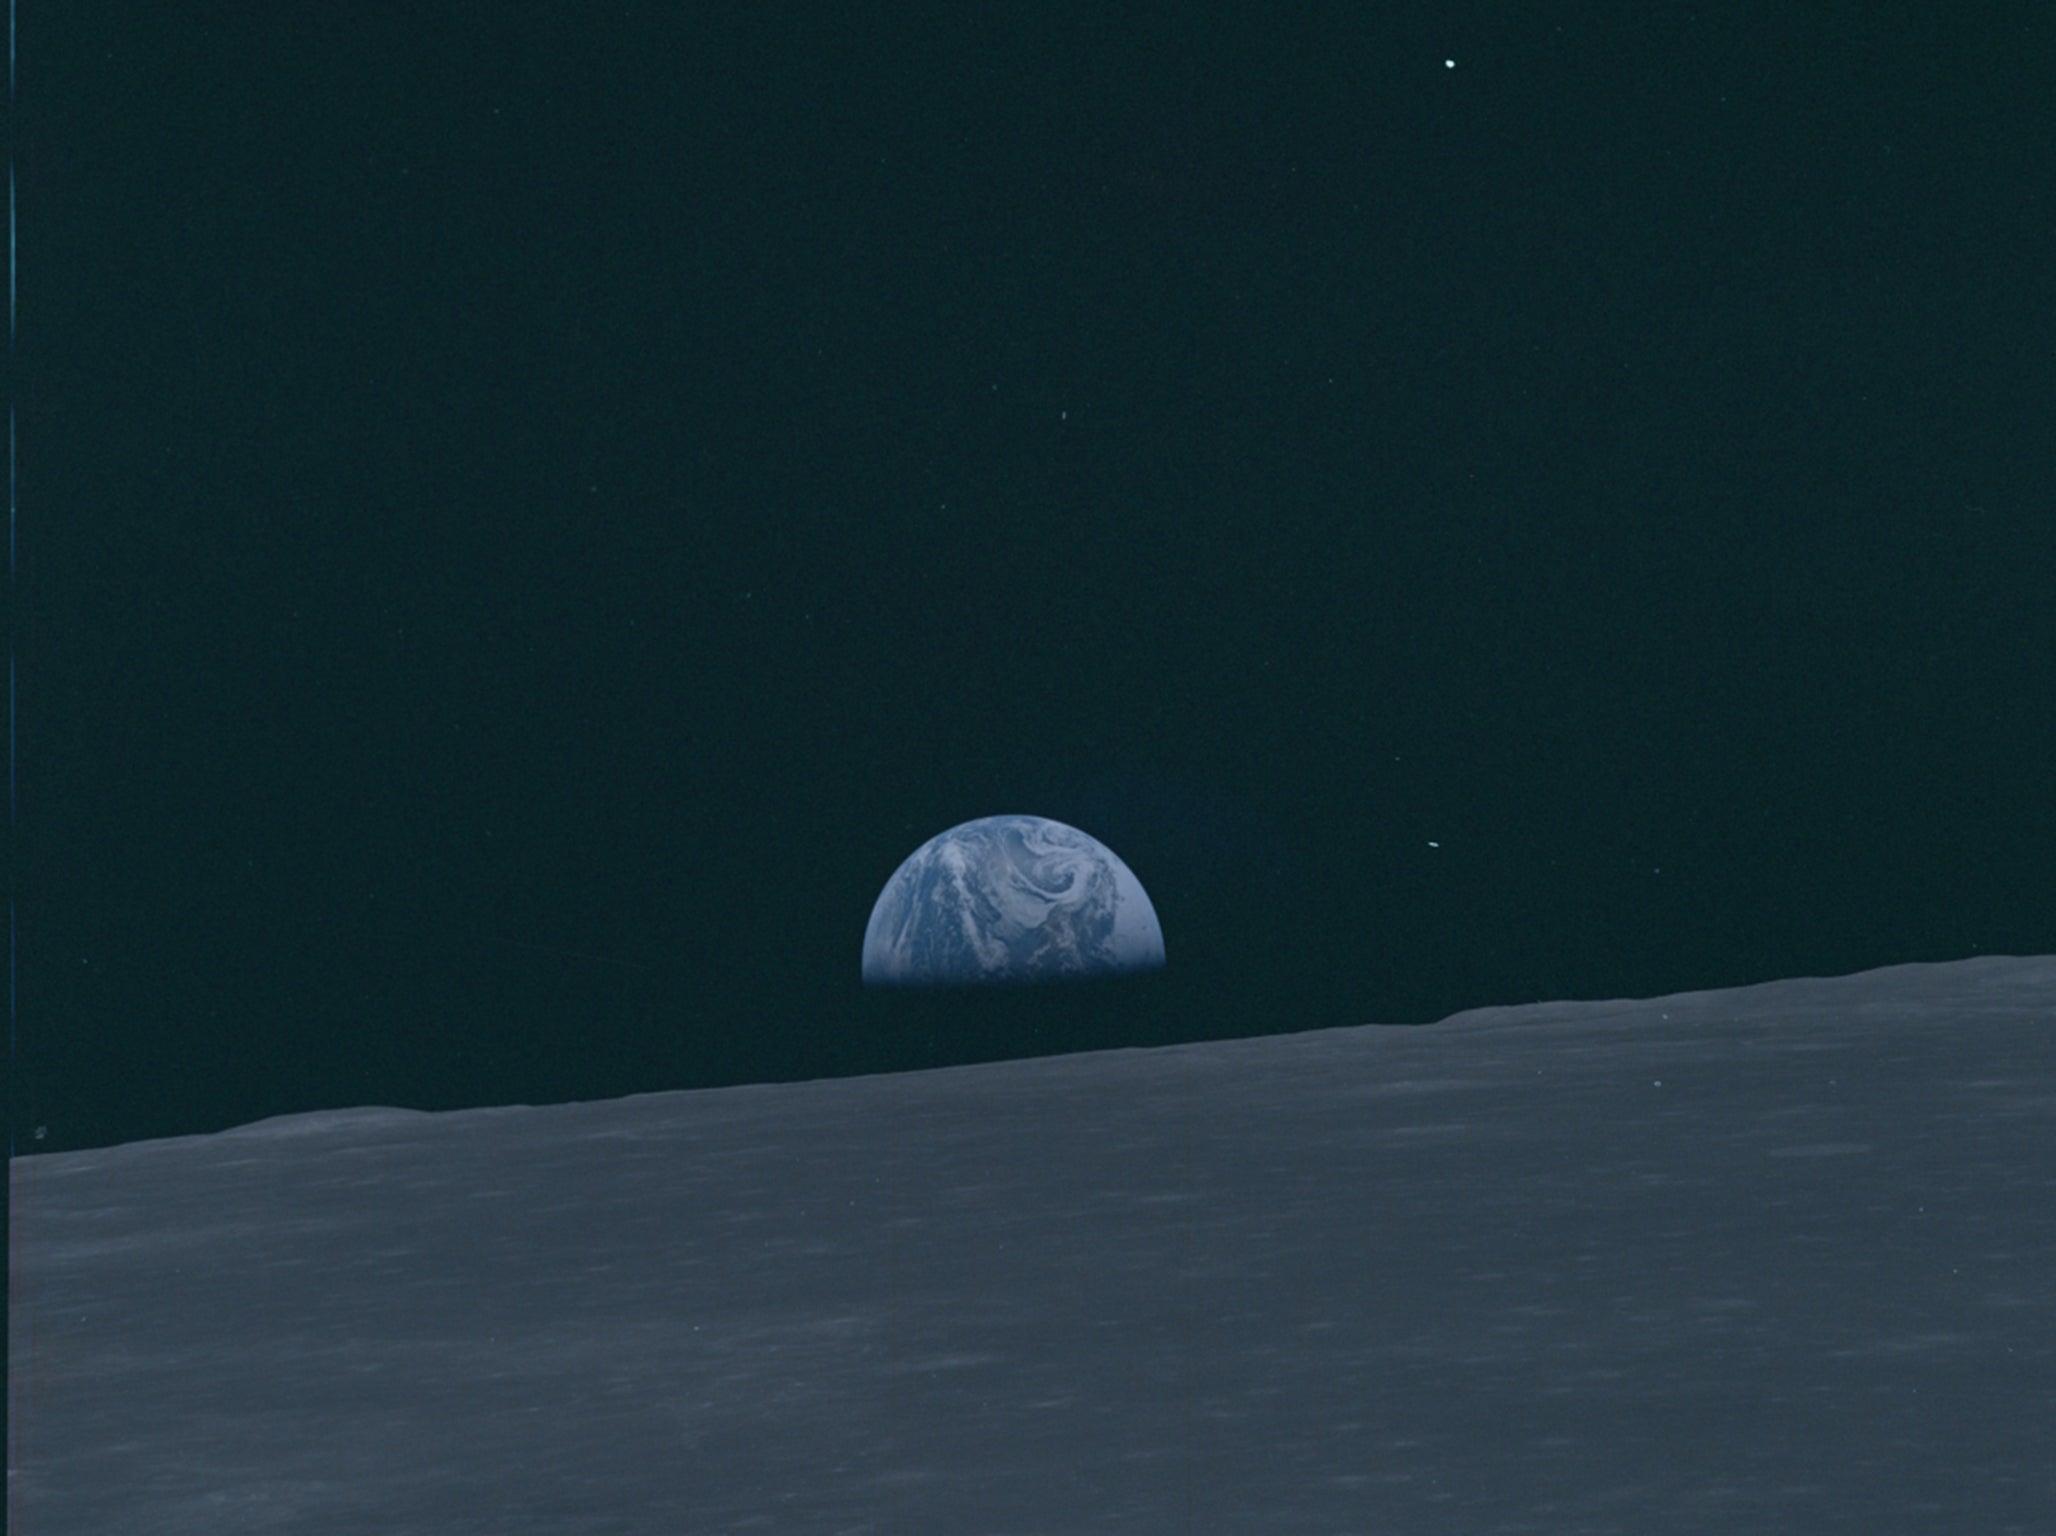 Dark Side of the Moon (film) - Wikipedia Nasa pictures of the dark side of moon